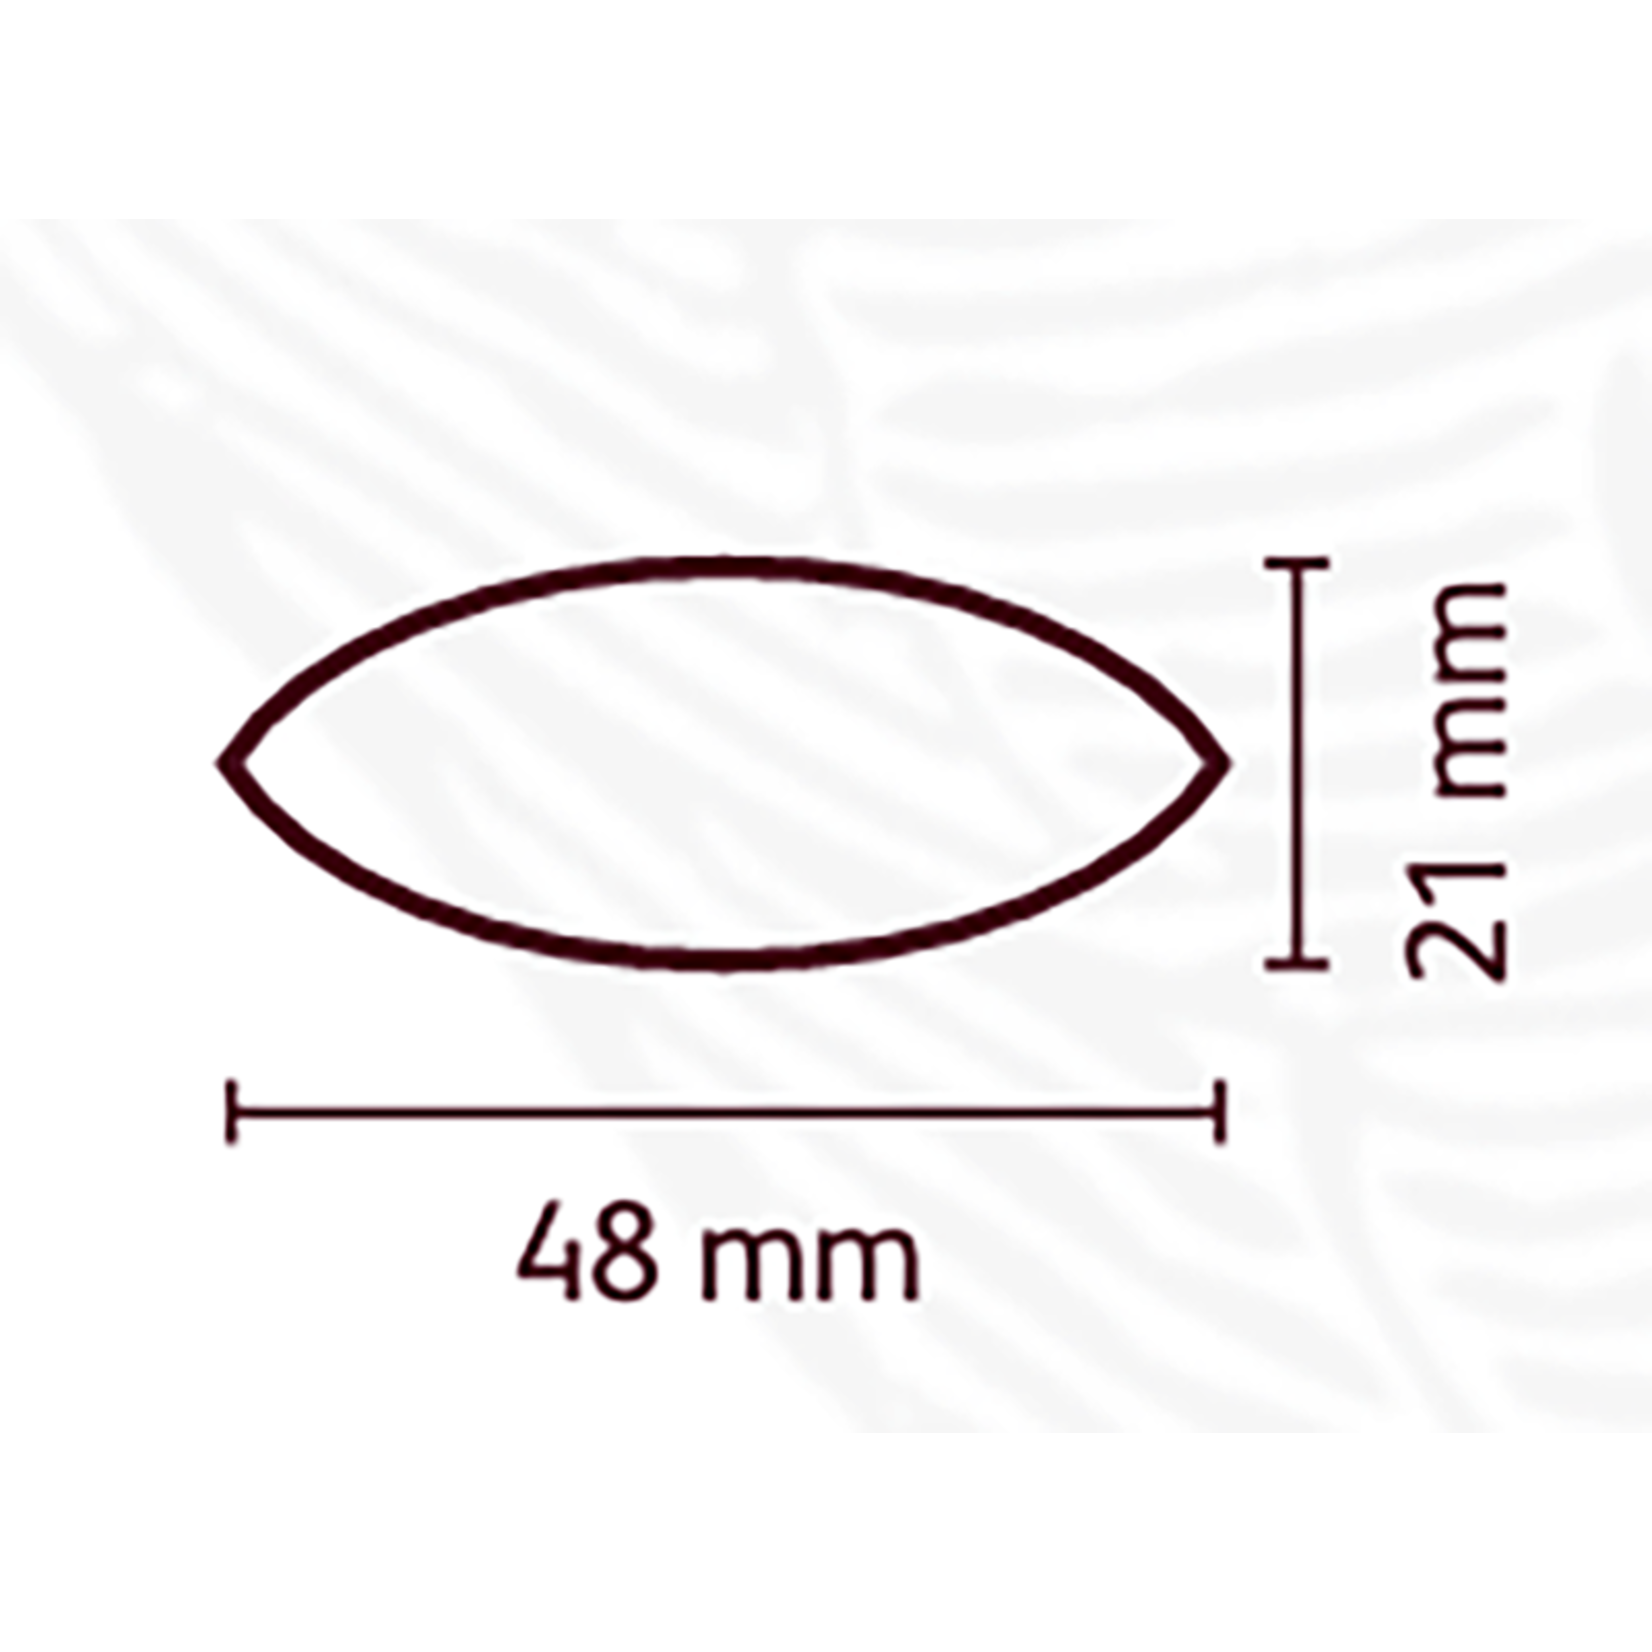 Cacao Barry Cacao Barry - Tritan Chocolate Mold - Cocoa Pod (24 cavity), MLD-090524-M00